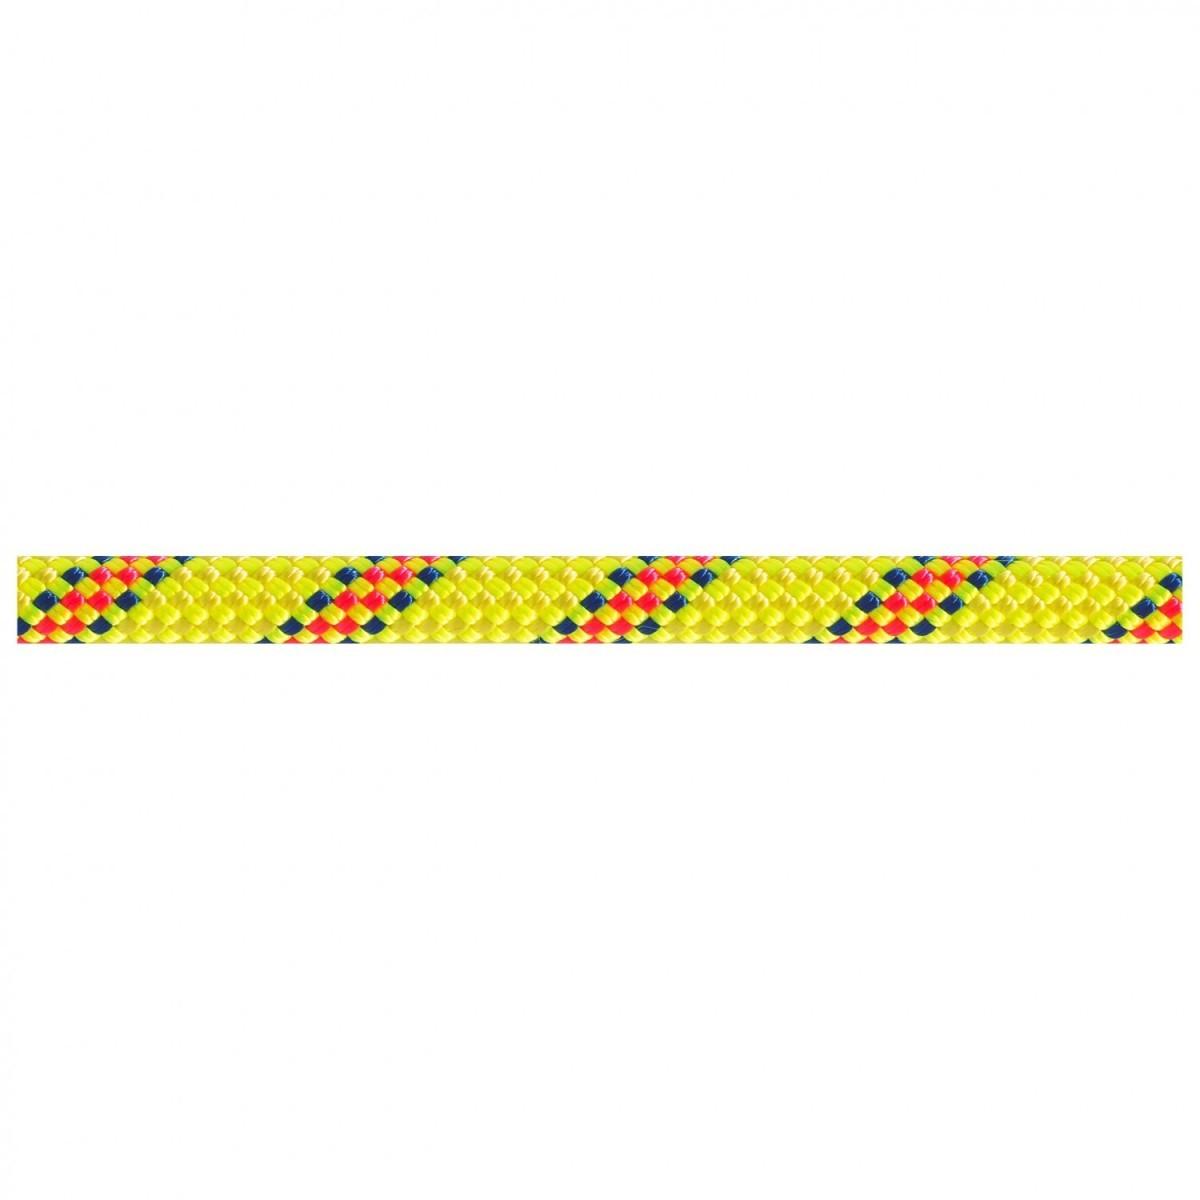 BEAL べアール Karma 9.8(70m - Yellow)★ロープ・ザイル・登山・クライミング★